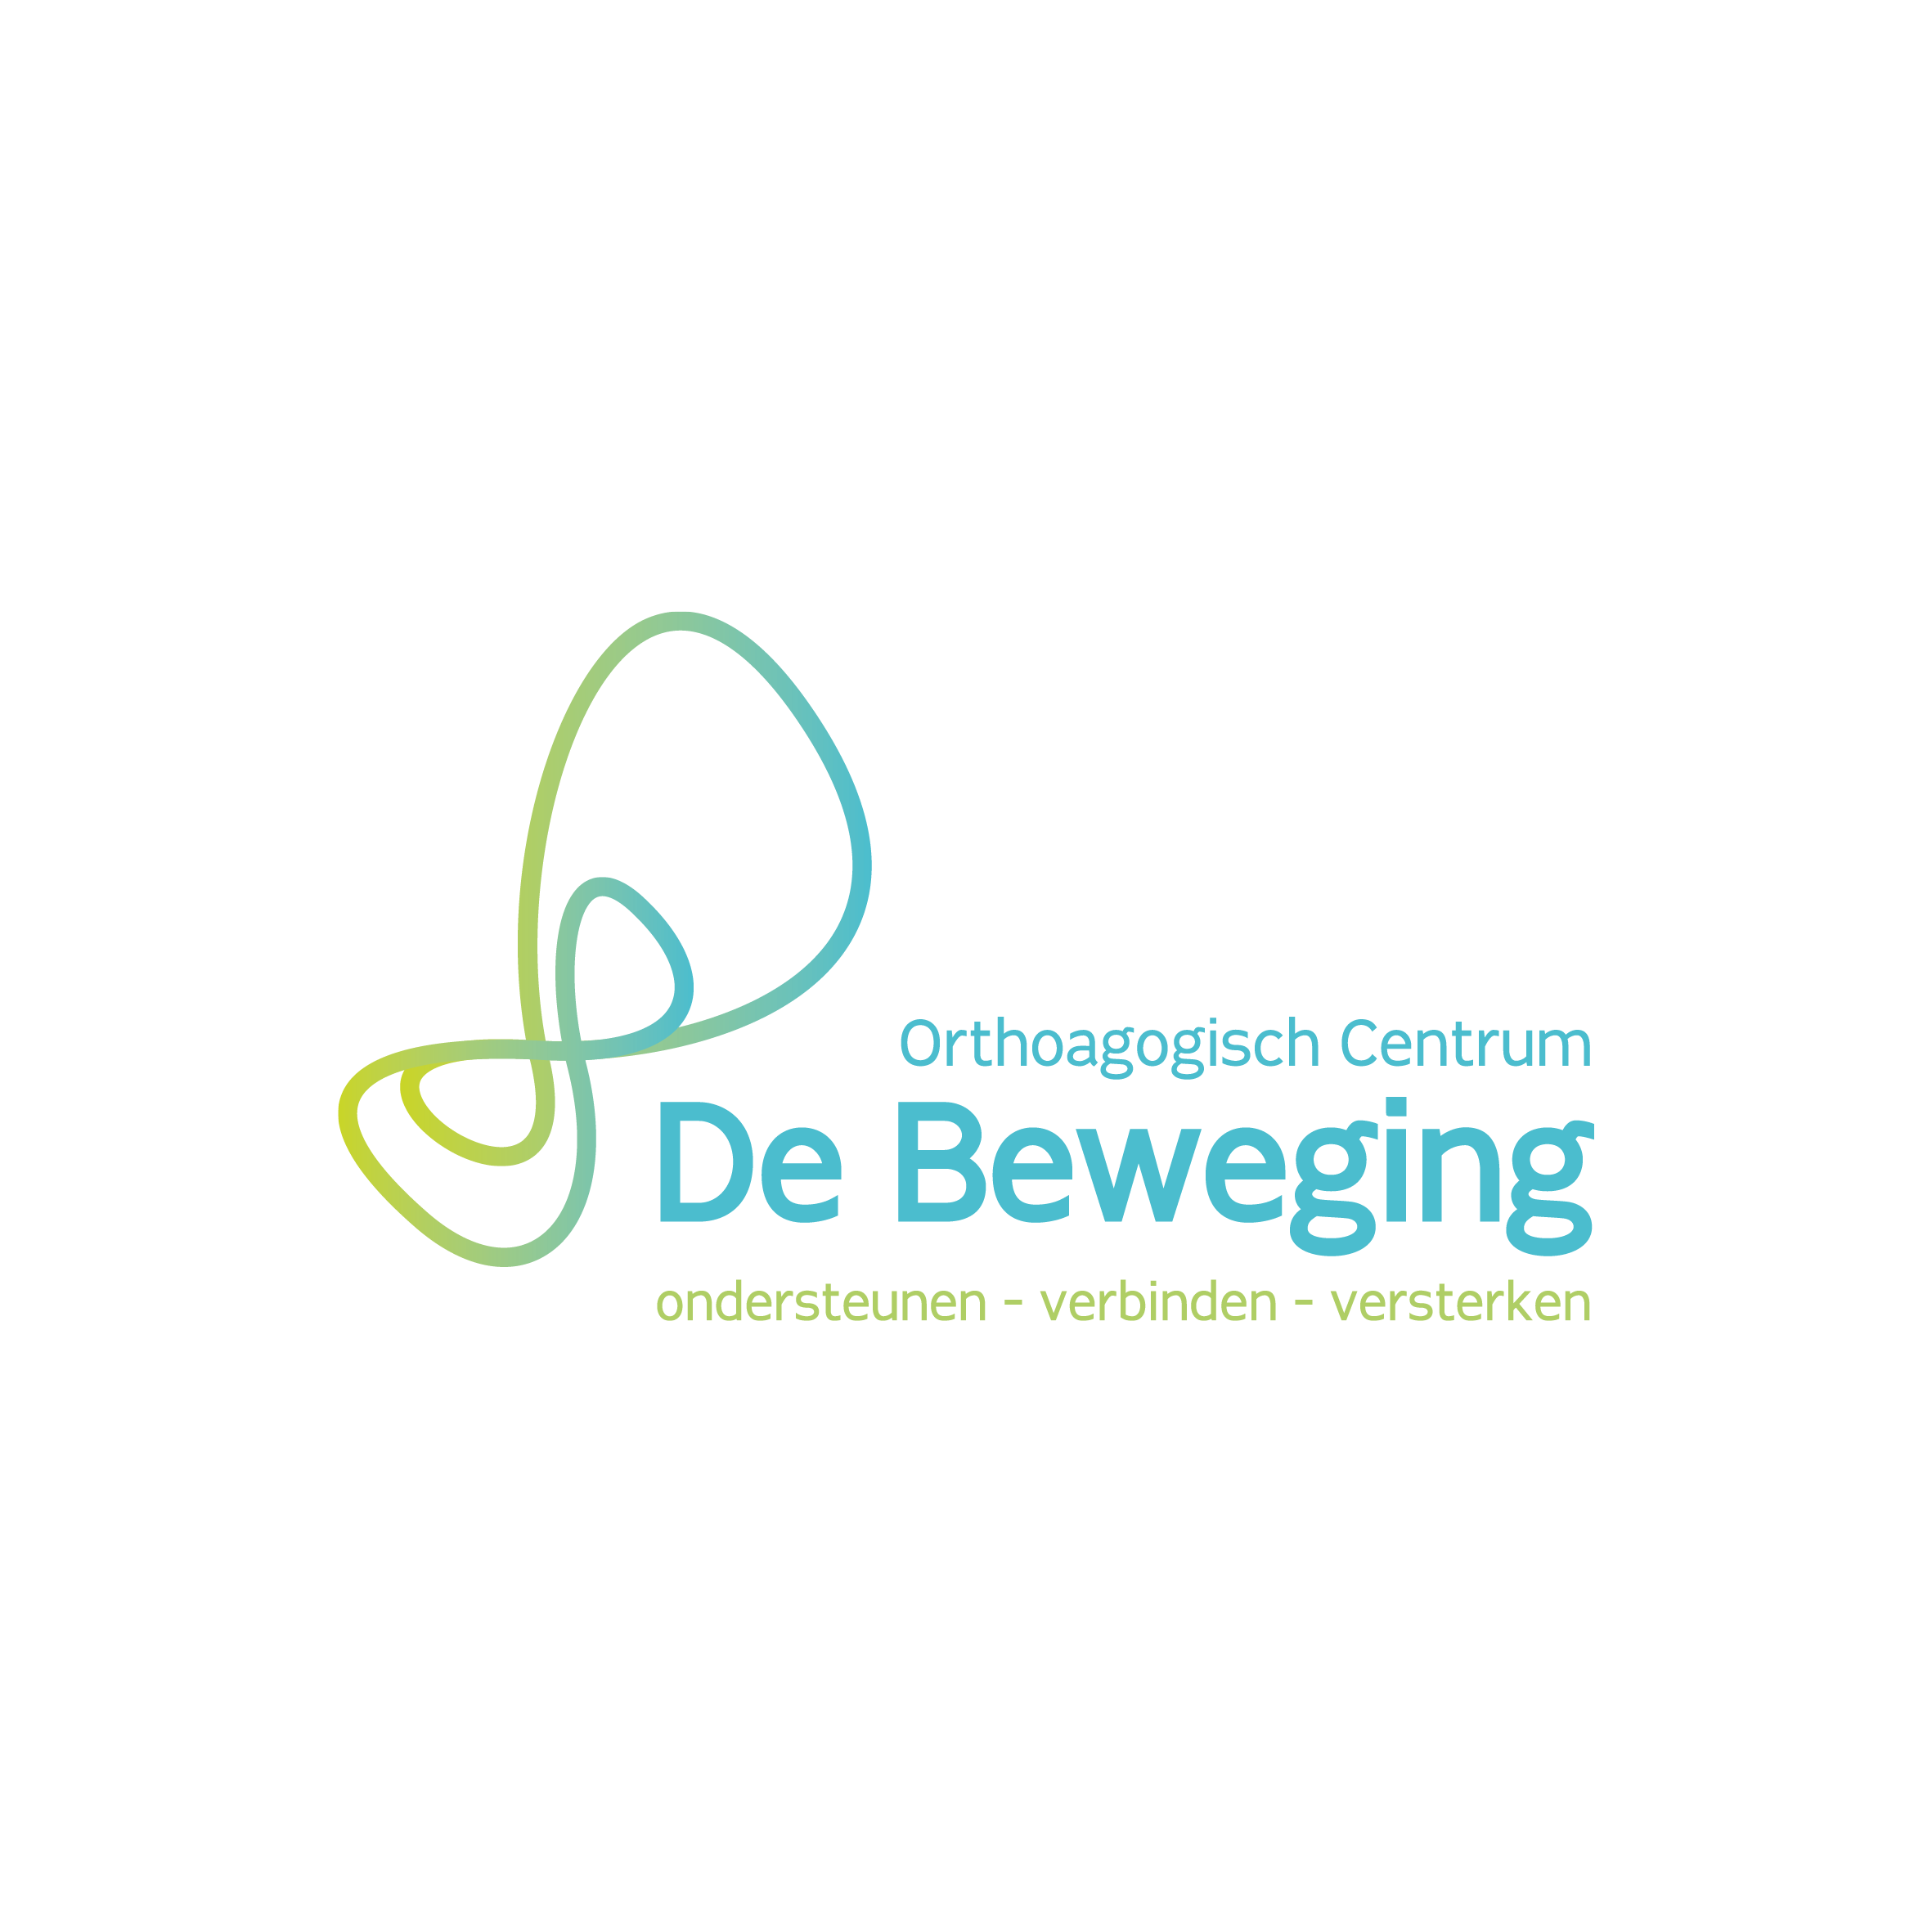 Logo logo OC De Beweging